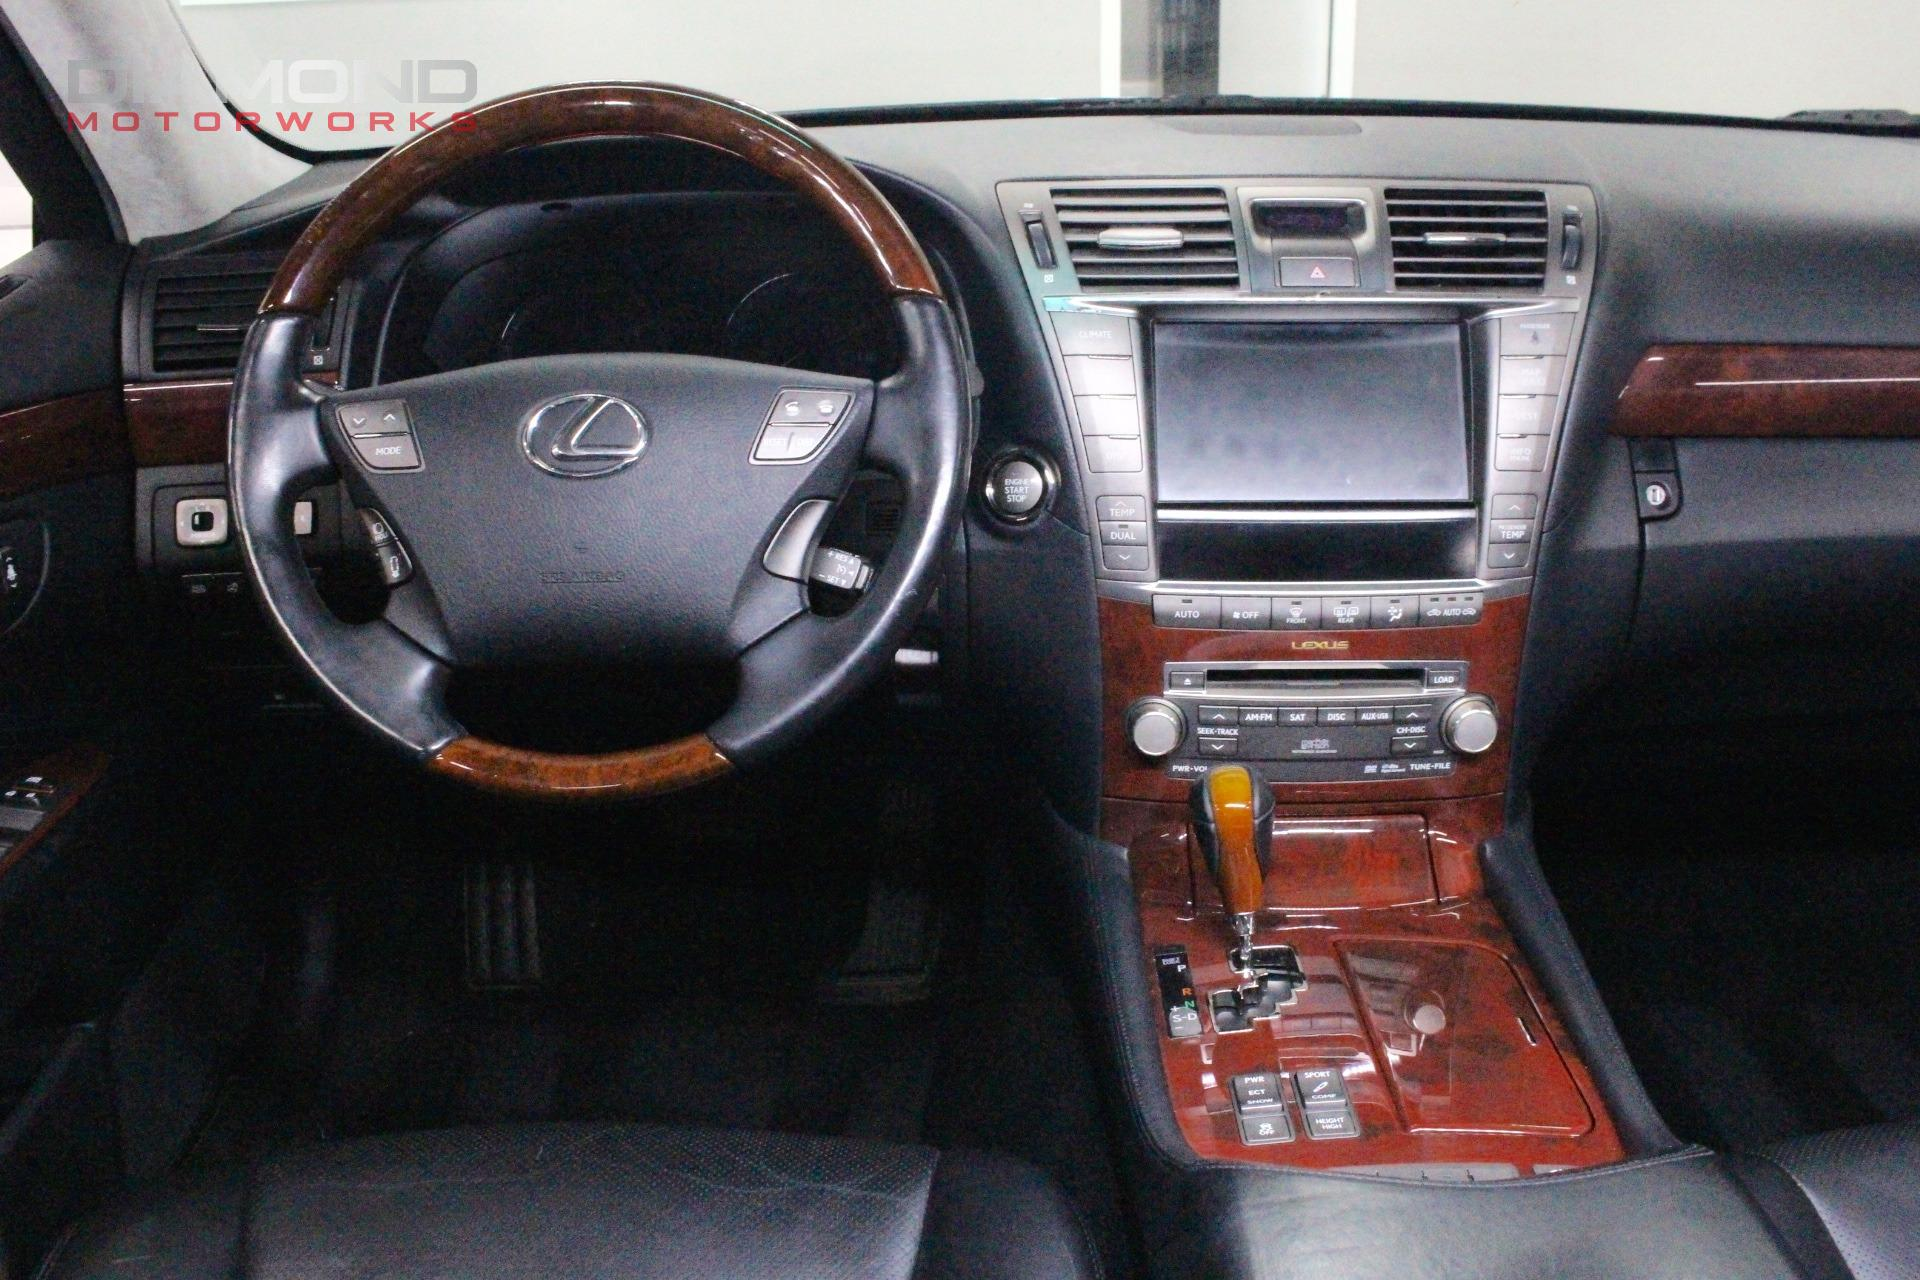 https://www.diamondmotorworks.com/imagetag/3088/5/l/Used-2010-Lexus-LS-460-L.jpg